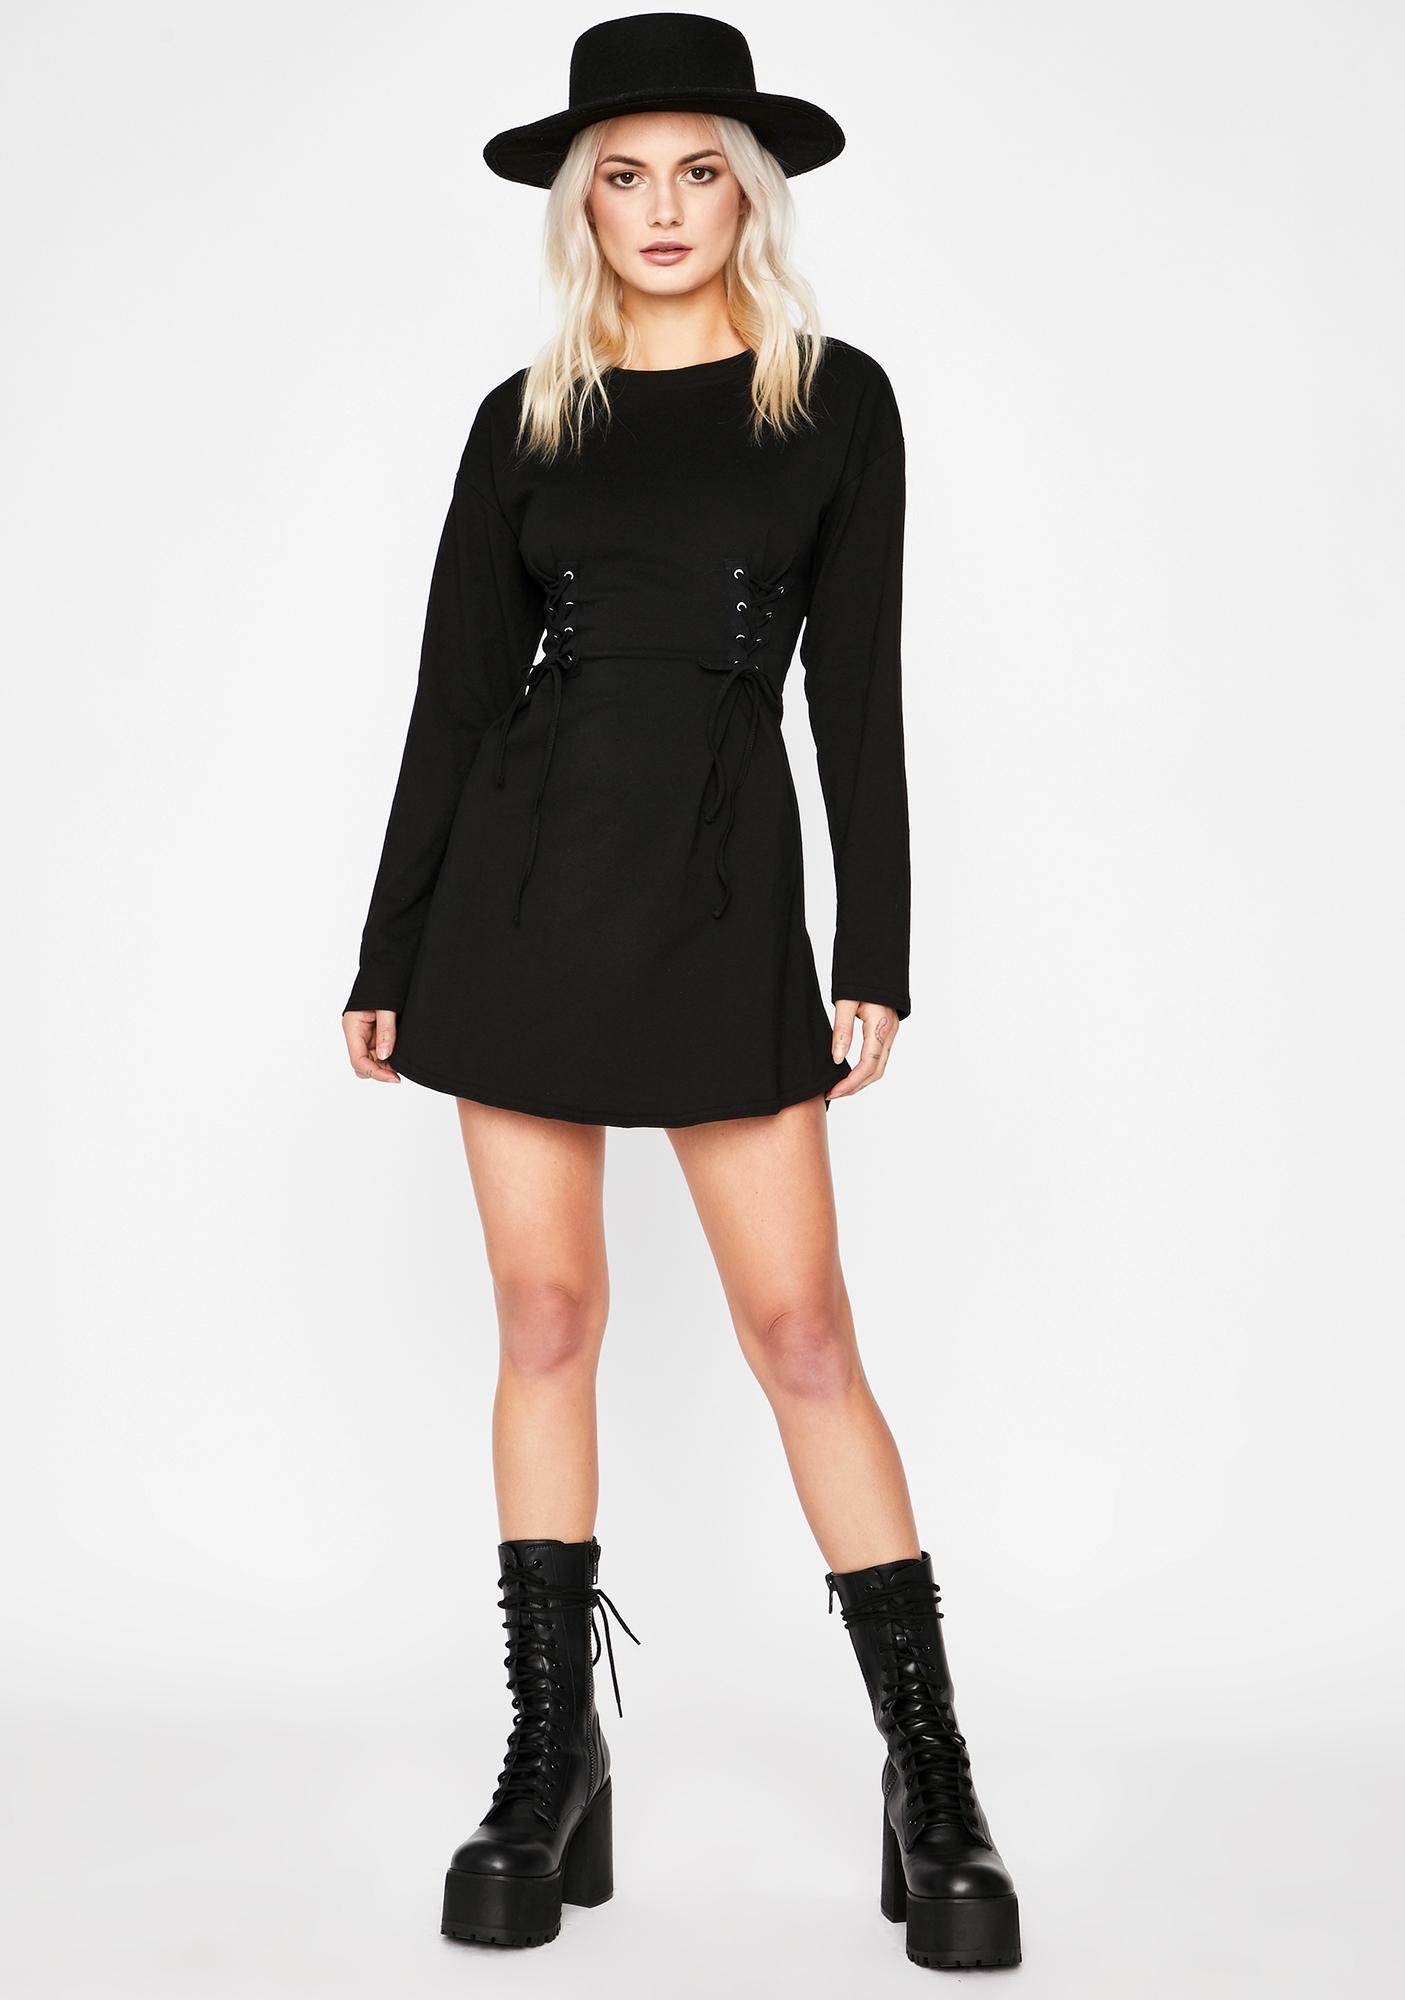 Expelled Envy Corset Dress